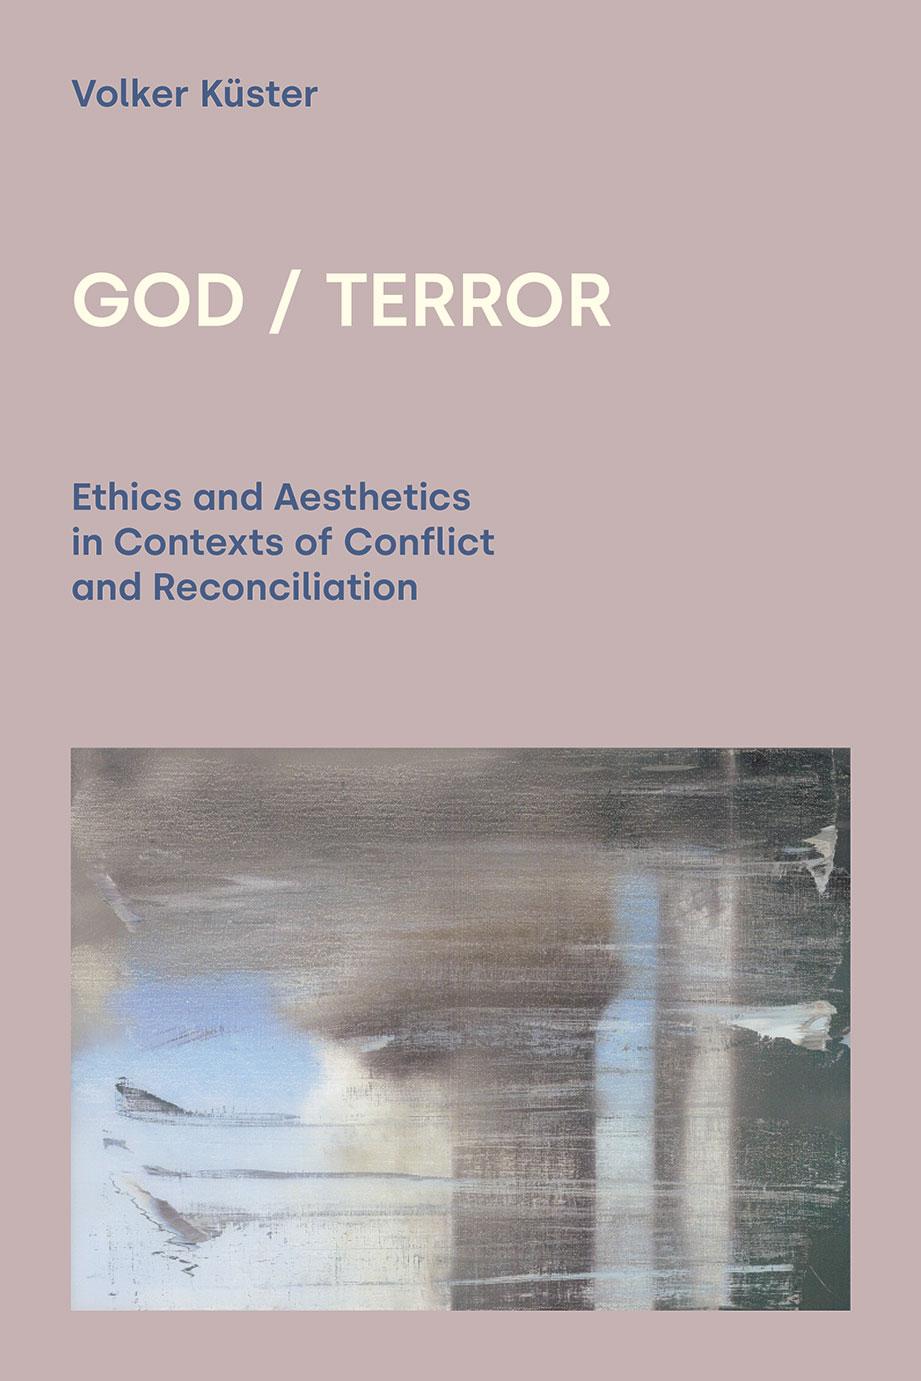 God/Terror